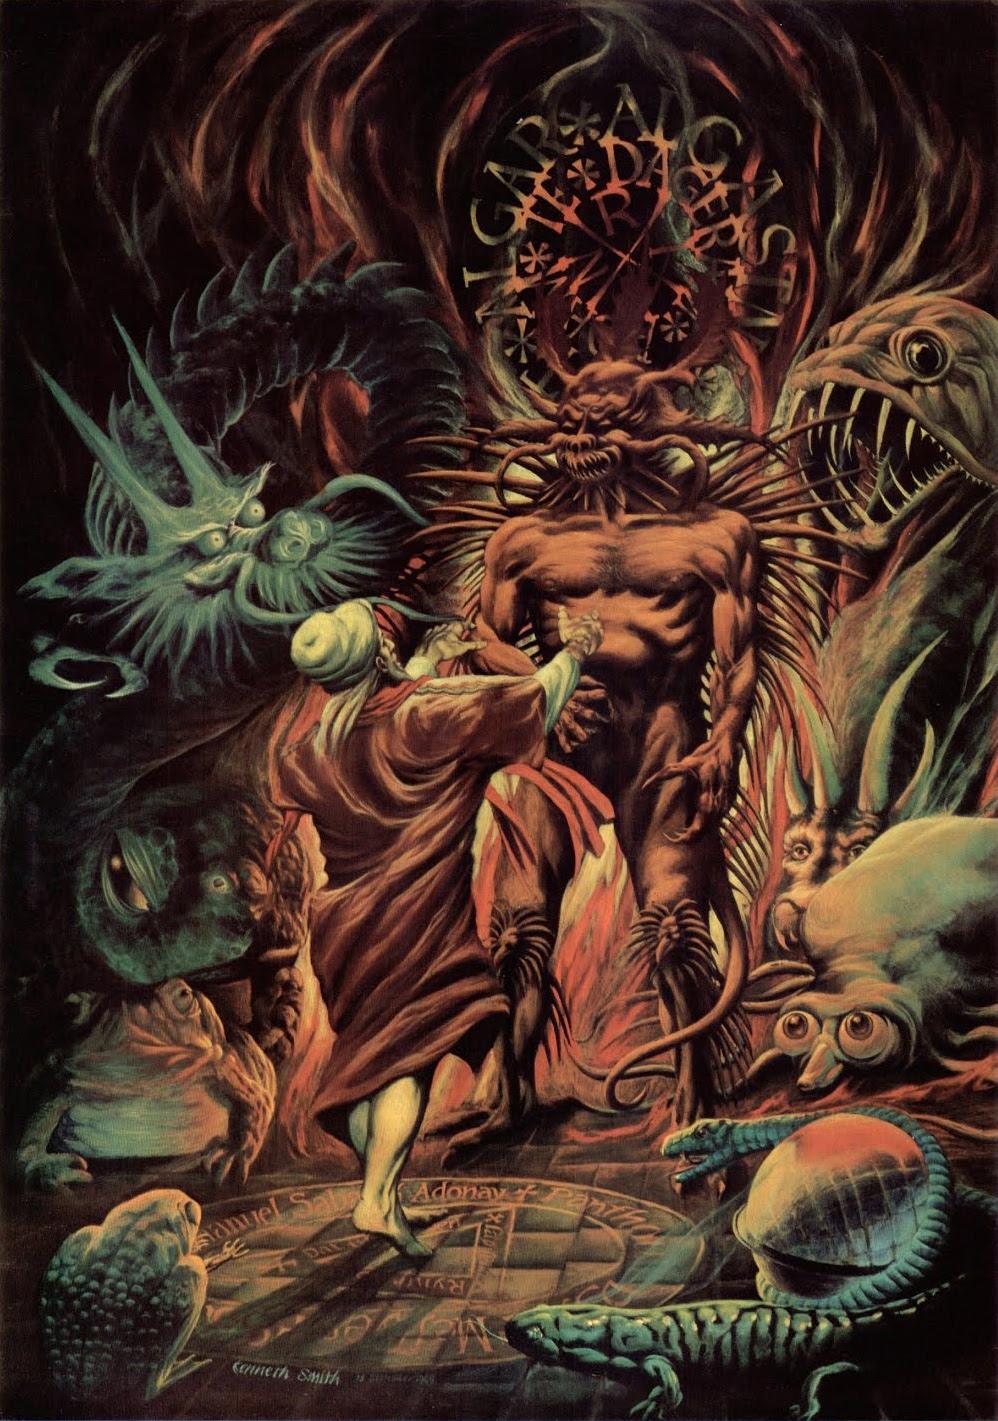 Kenneth Smith - Sorcerer, 1969